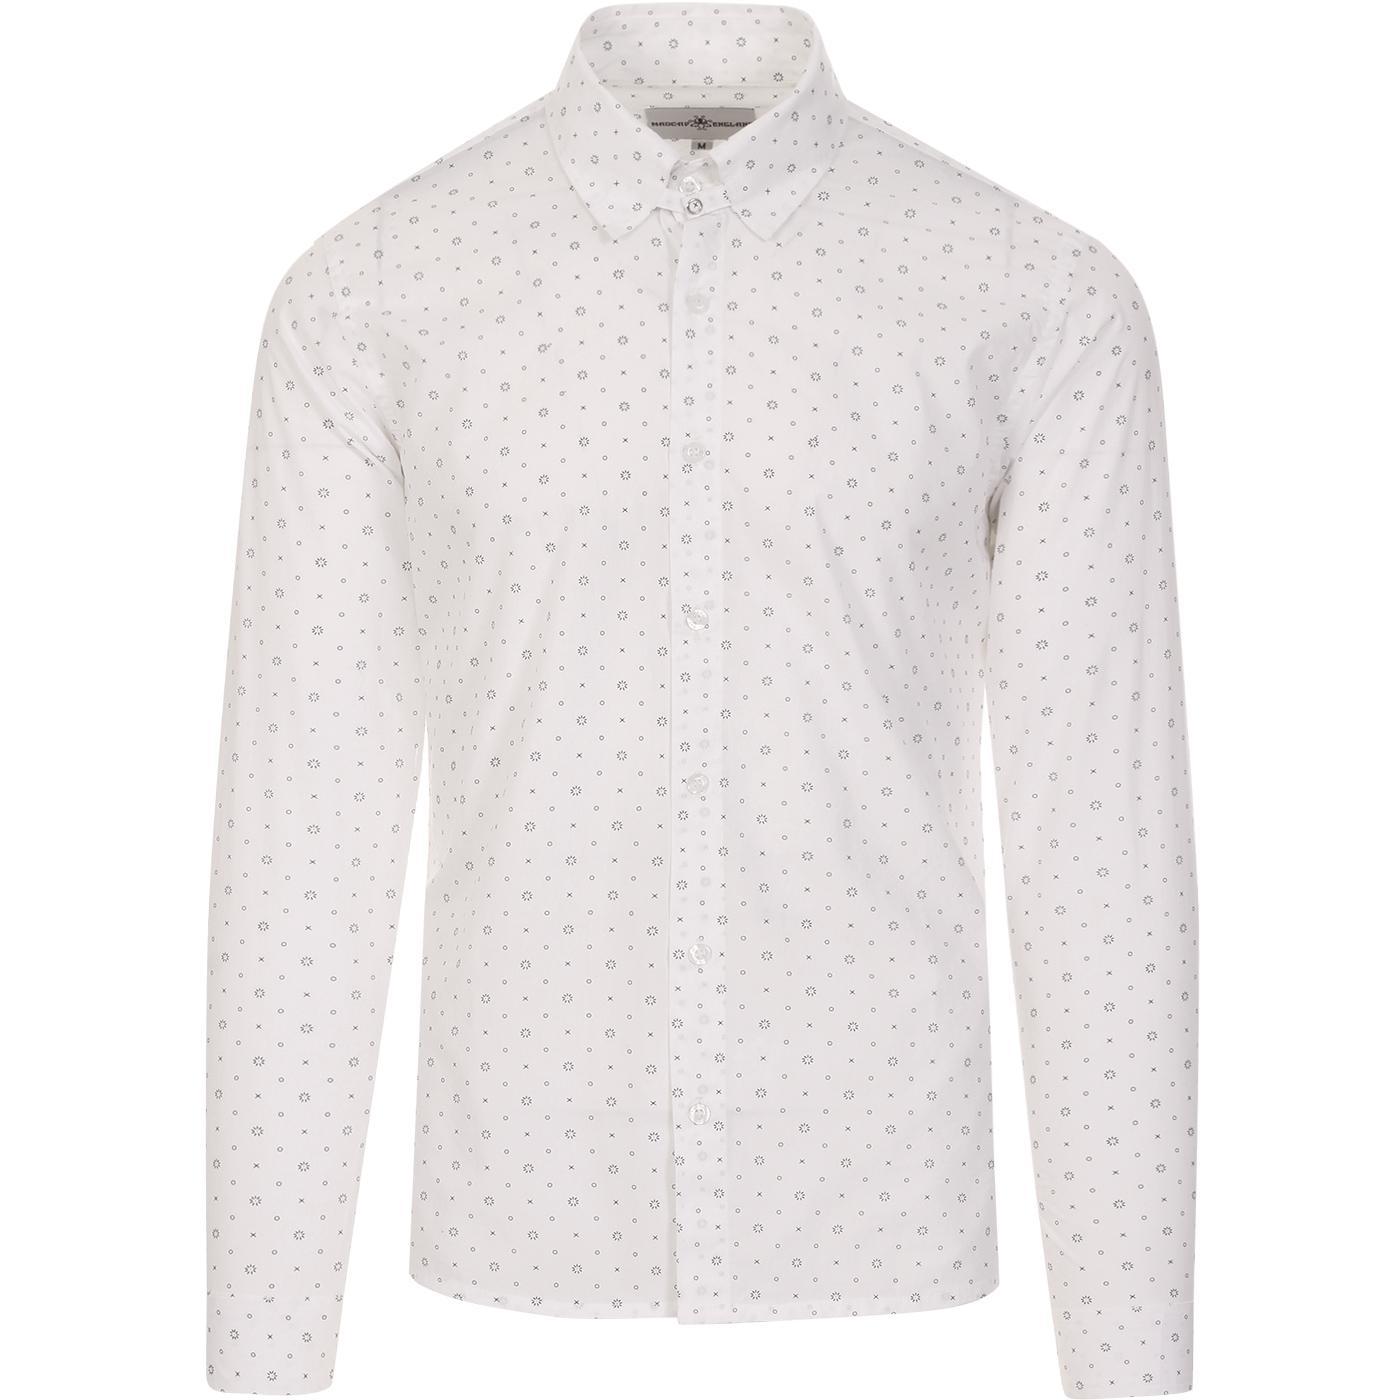 madcap england mens tab collar patterned long sleeve shirt white